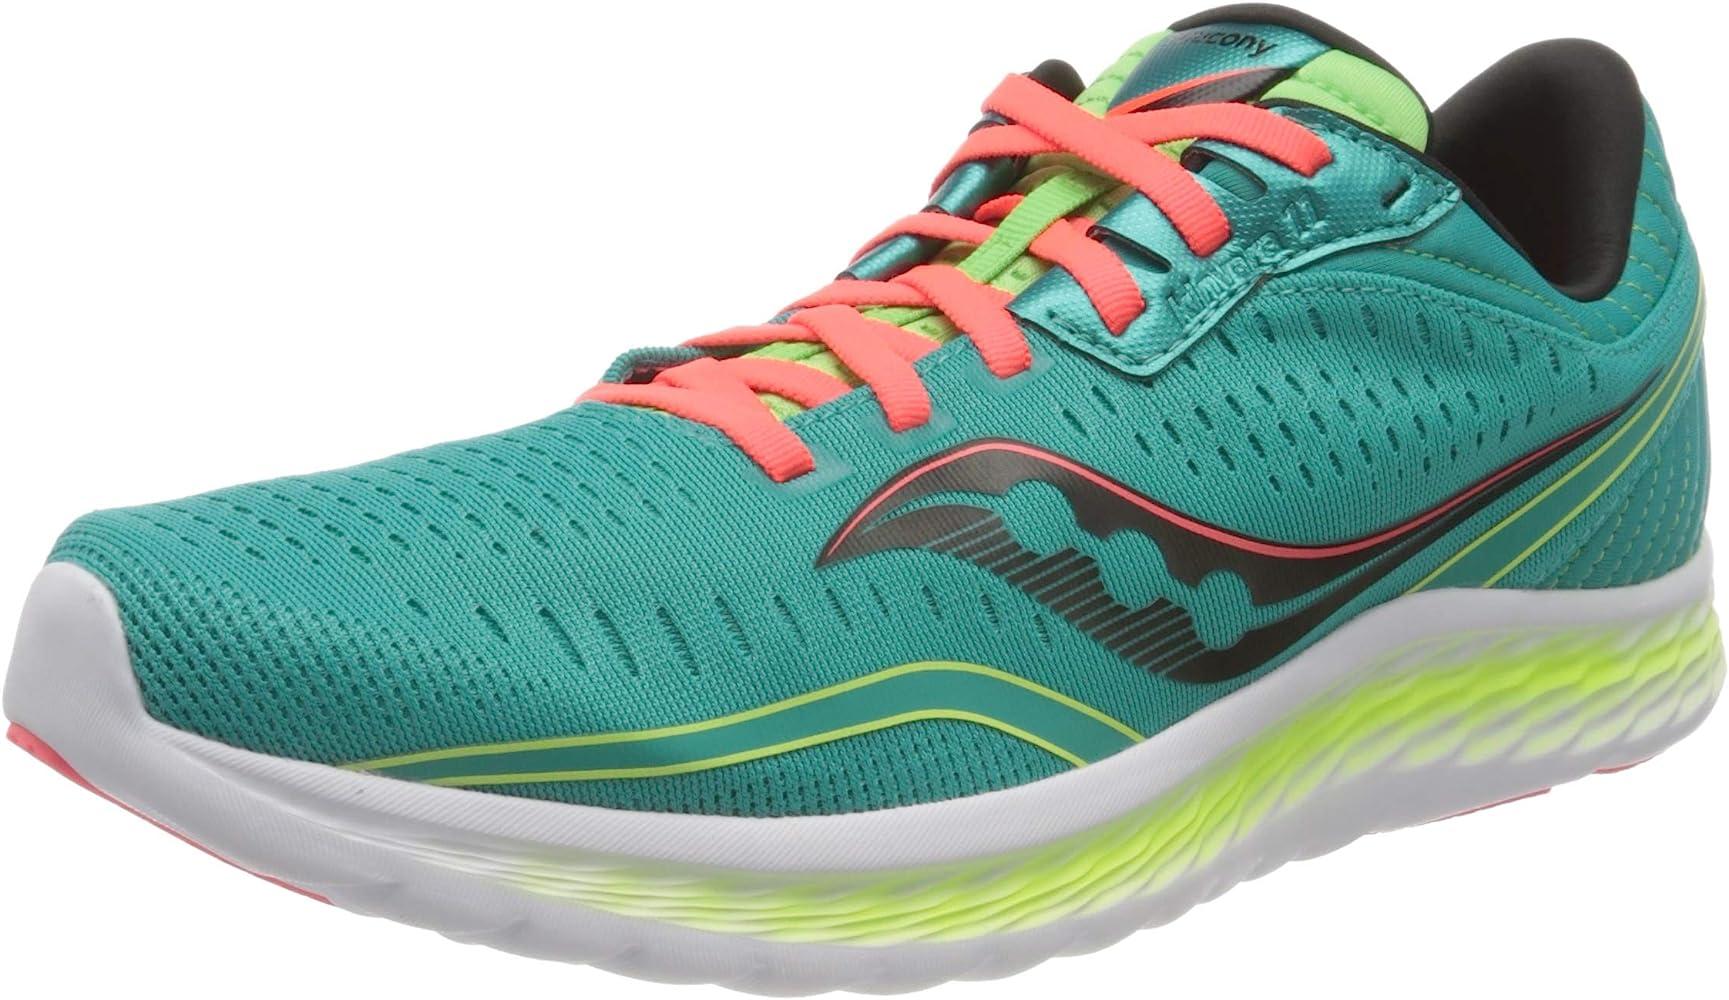 Saucony Kinvara 11 running shoe for